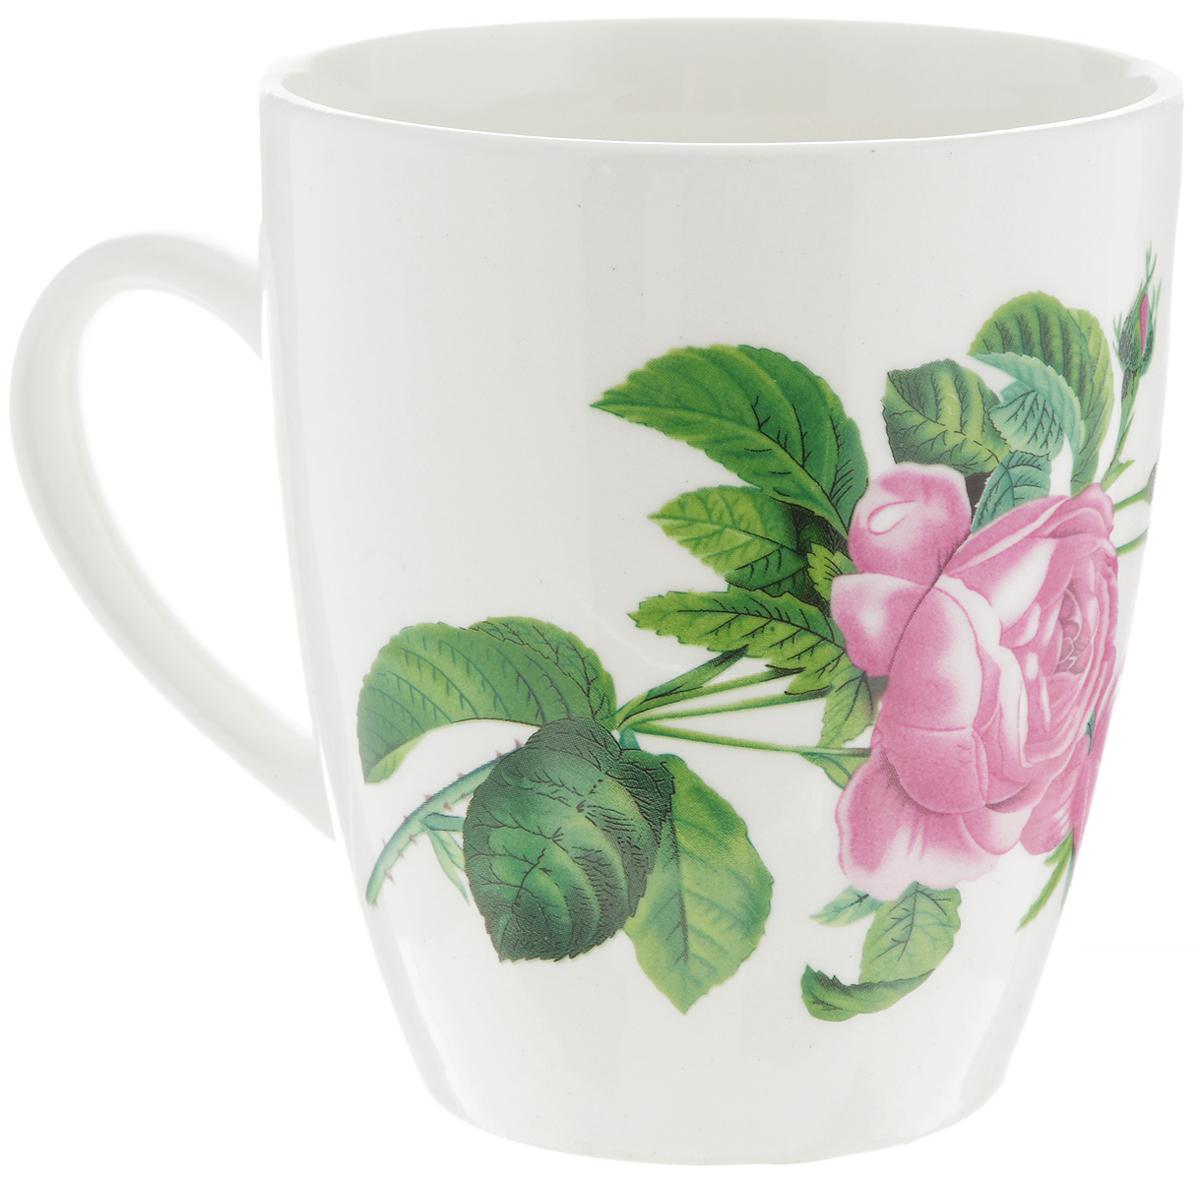 Кружка Кубаньфарфор Роза Кавказа, 370 мл салатник кубаньфарфор роза кавказа 18 5 х 18 5 см